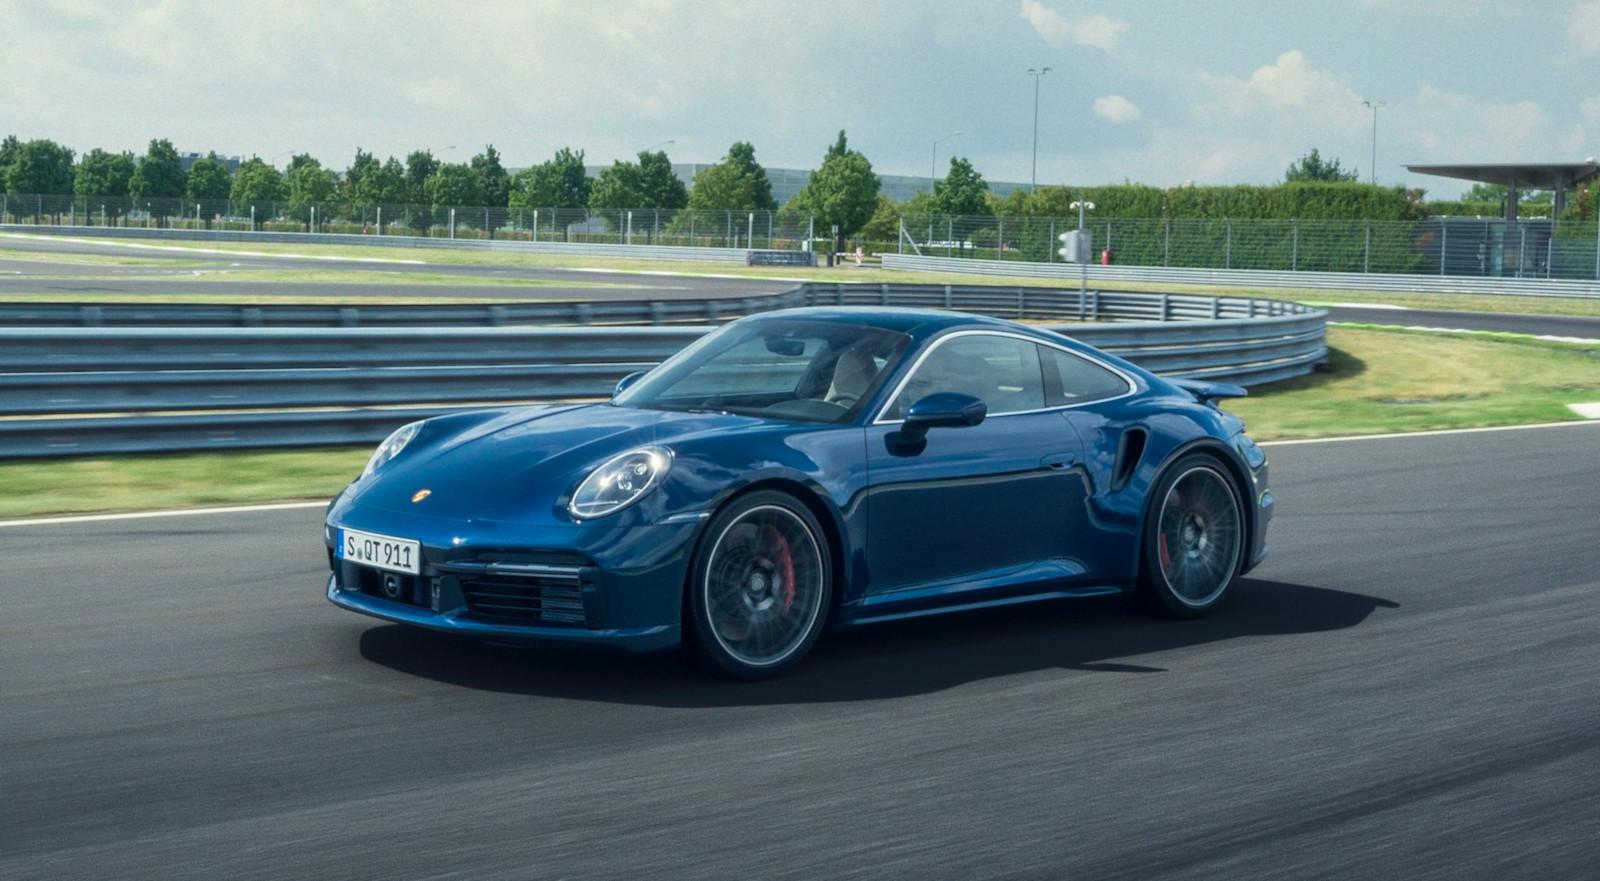 Porsche encabeza el segmento de lujo en estudio de J.D. Power